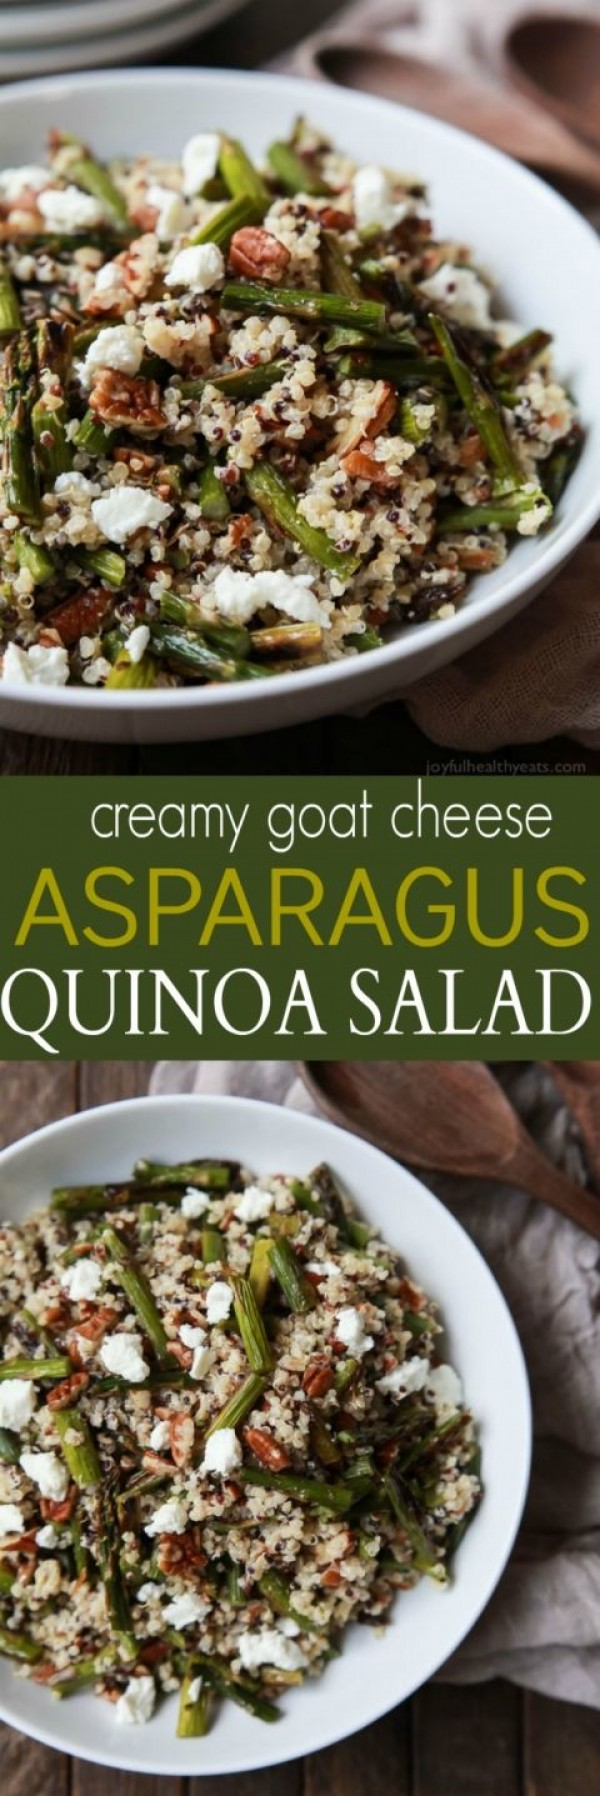 Get the recipe Goat Cheese Asparagus Quinoa Salad @recipes_to_go